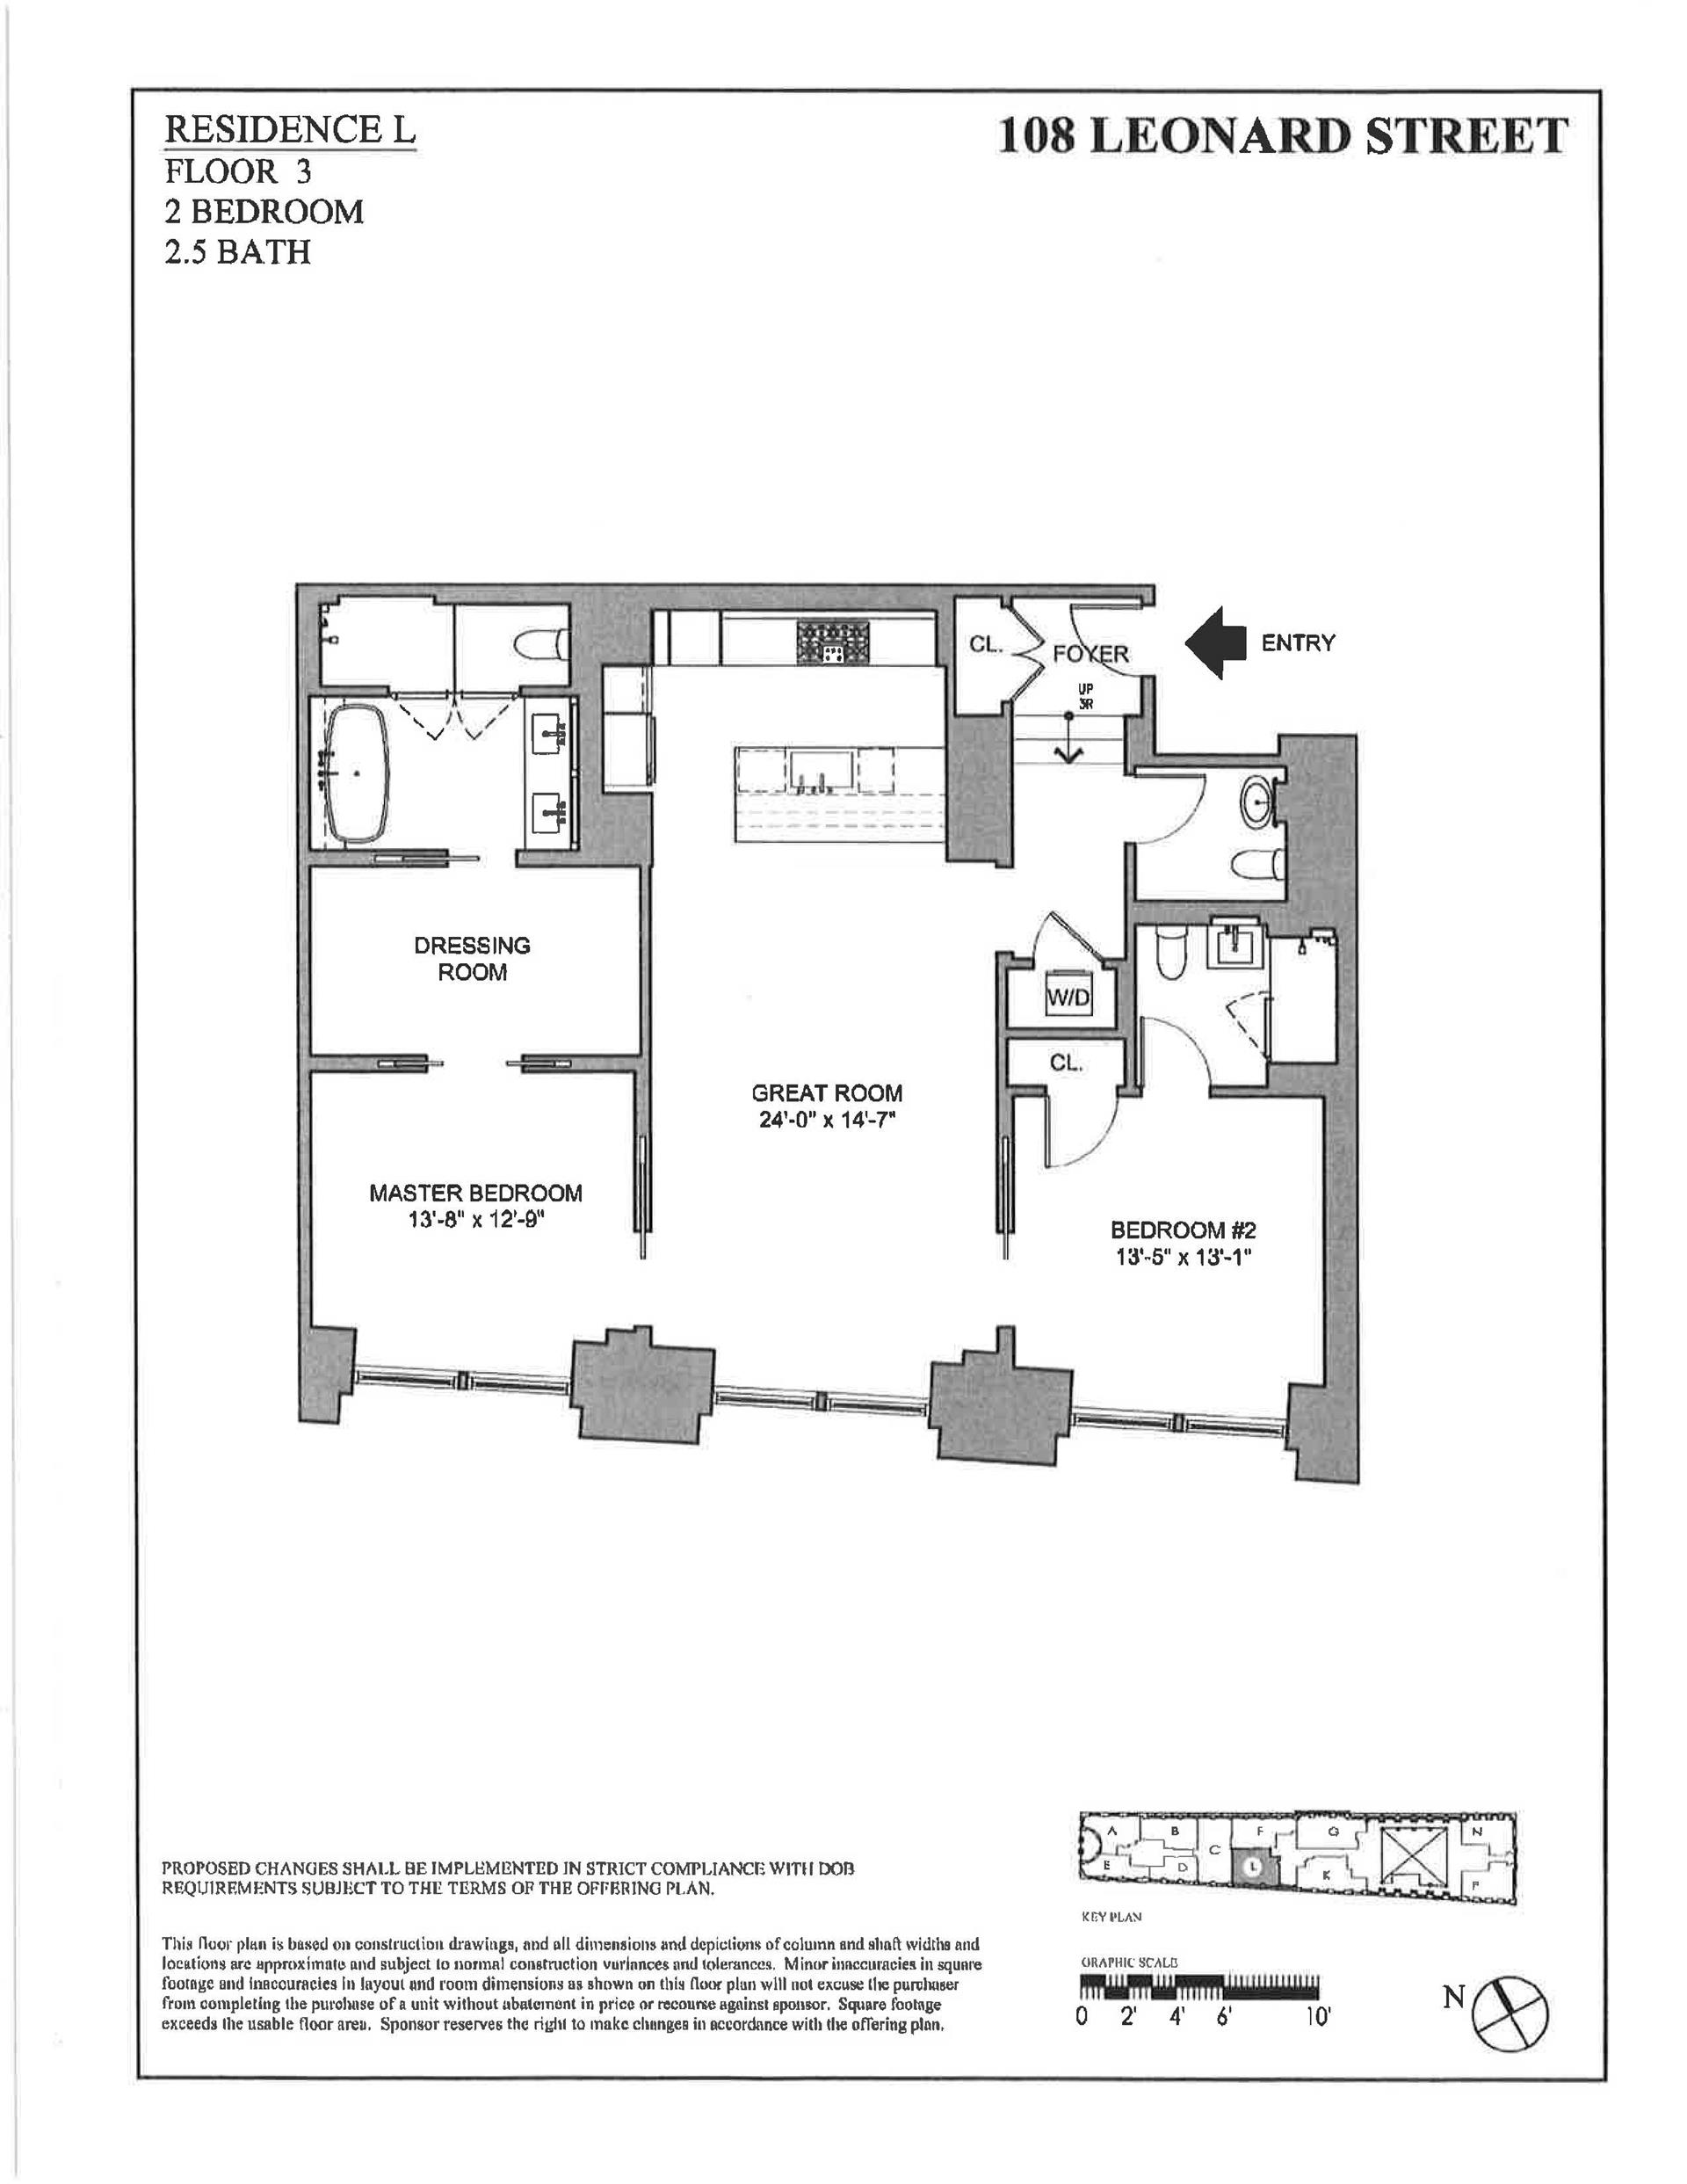 Floor plan of 108 Leonard St, 3L - TriBeCa, New York